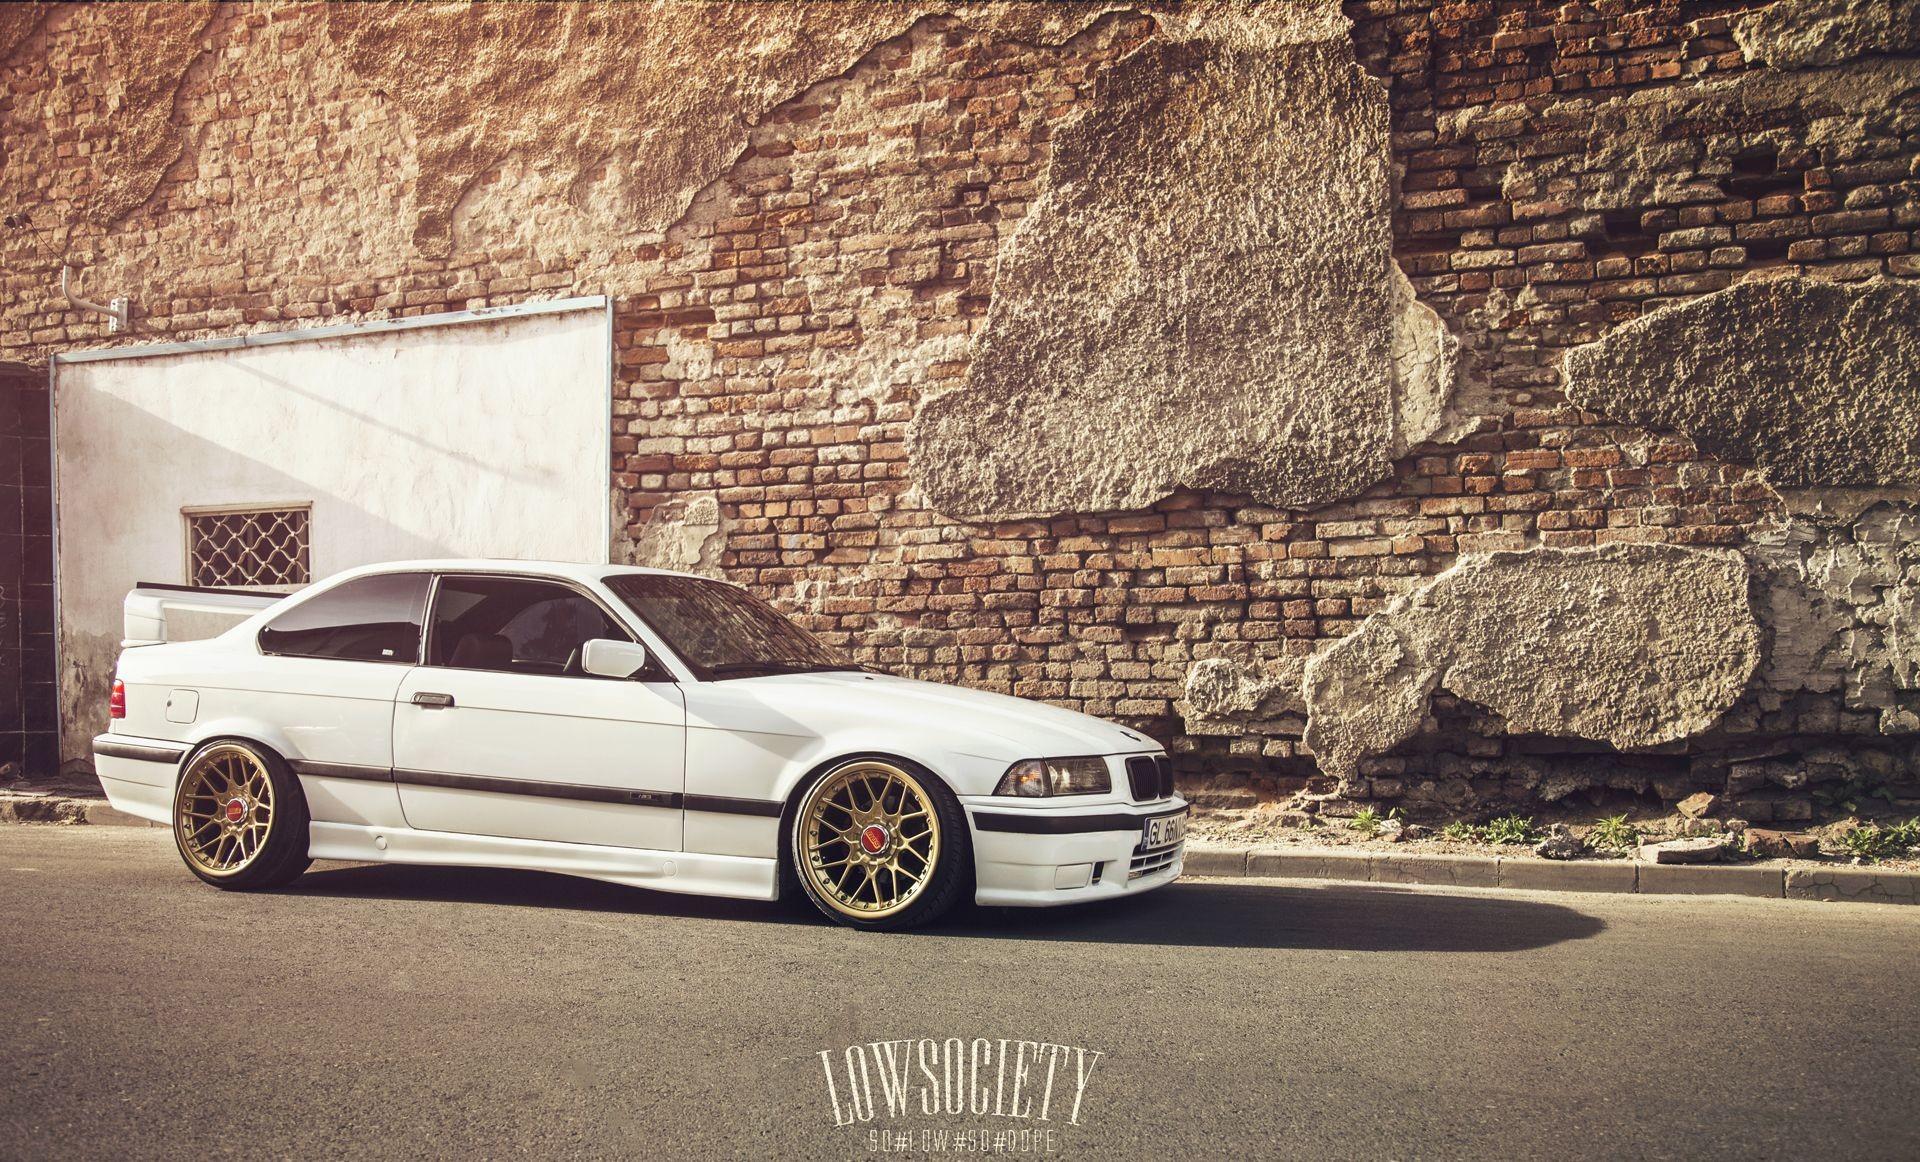 BMW E36 Wallpaper (61+ images)